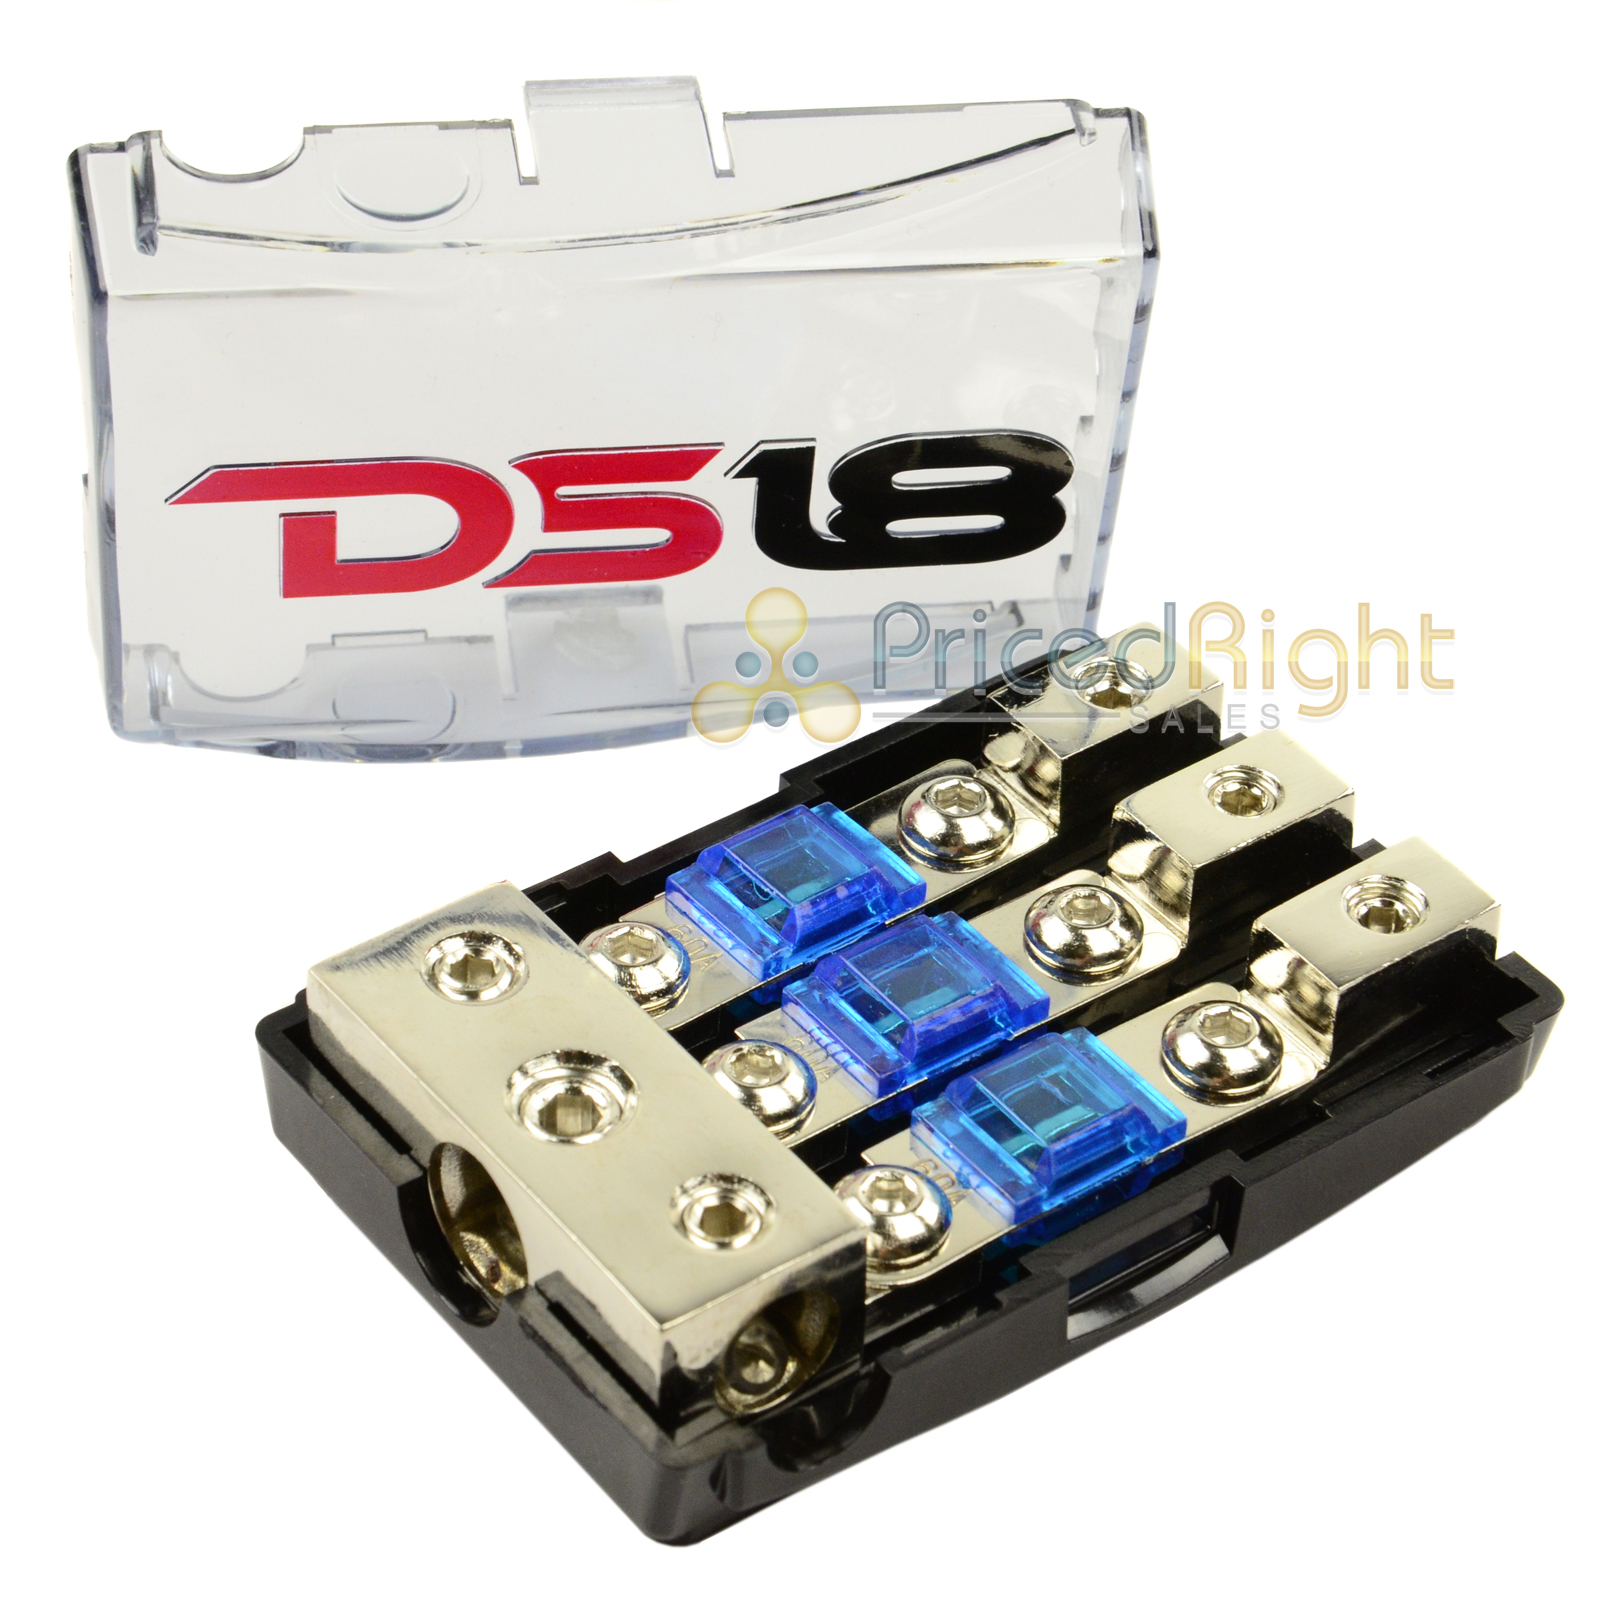 hight resolution of ds18 mini anl fuse holder 0 4 8 gauge input output fd1024 distribution block